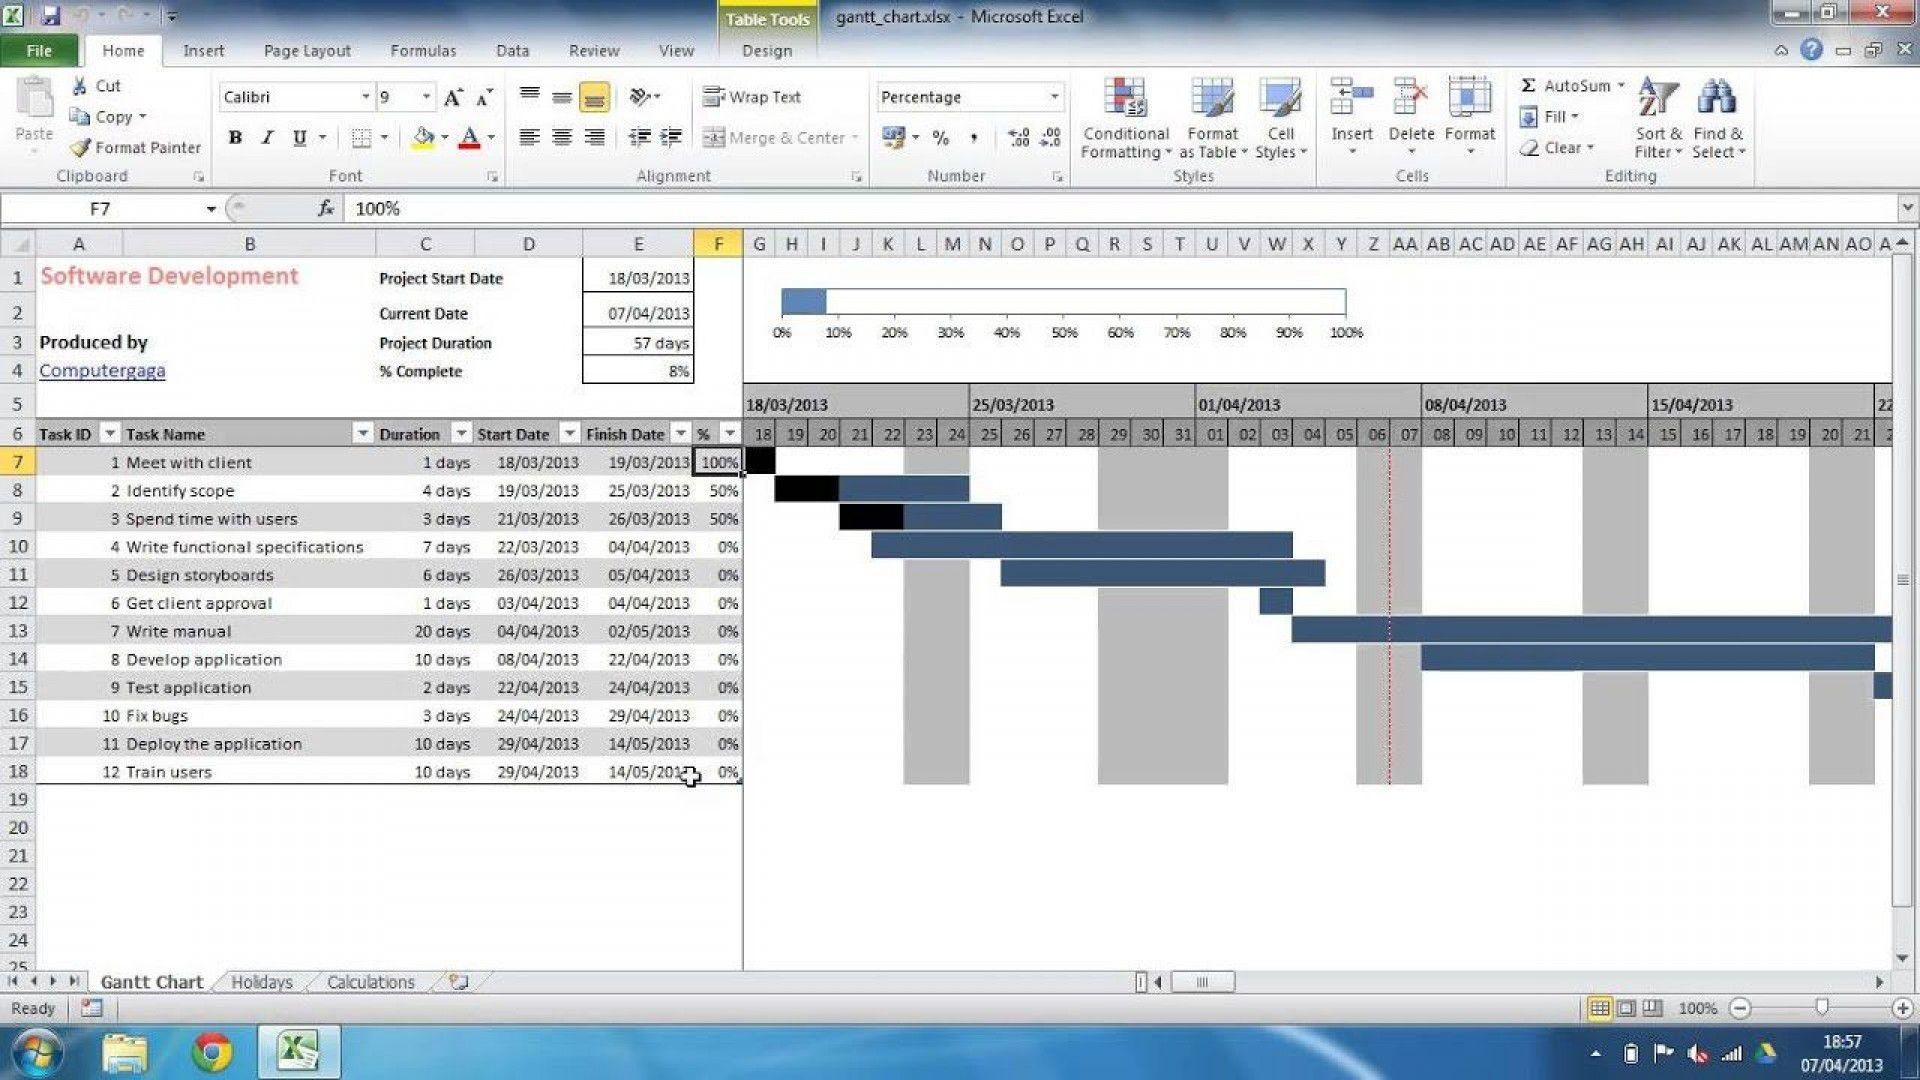 003 Outstanding Gantt Chart Template In Excel 2020 Sample  Free1920